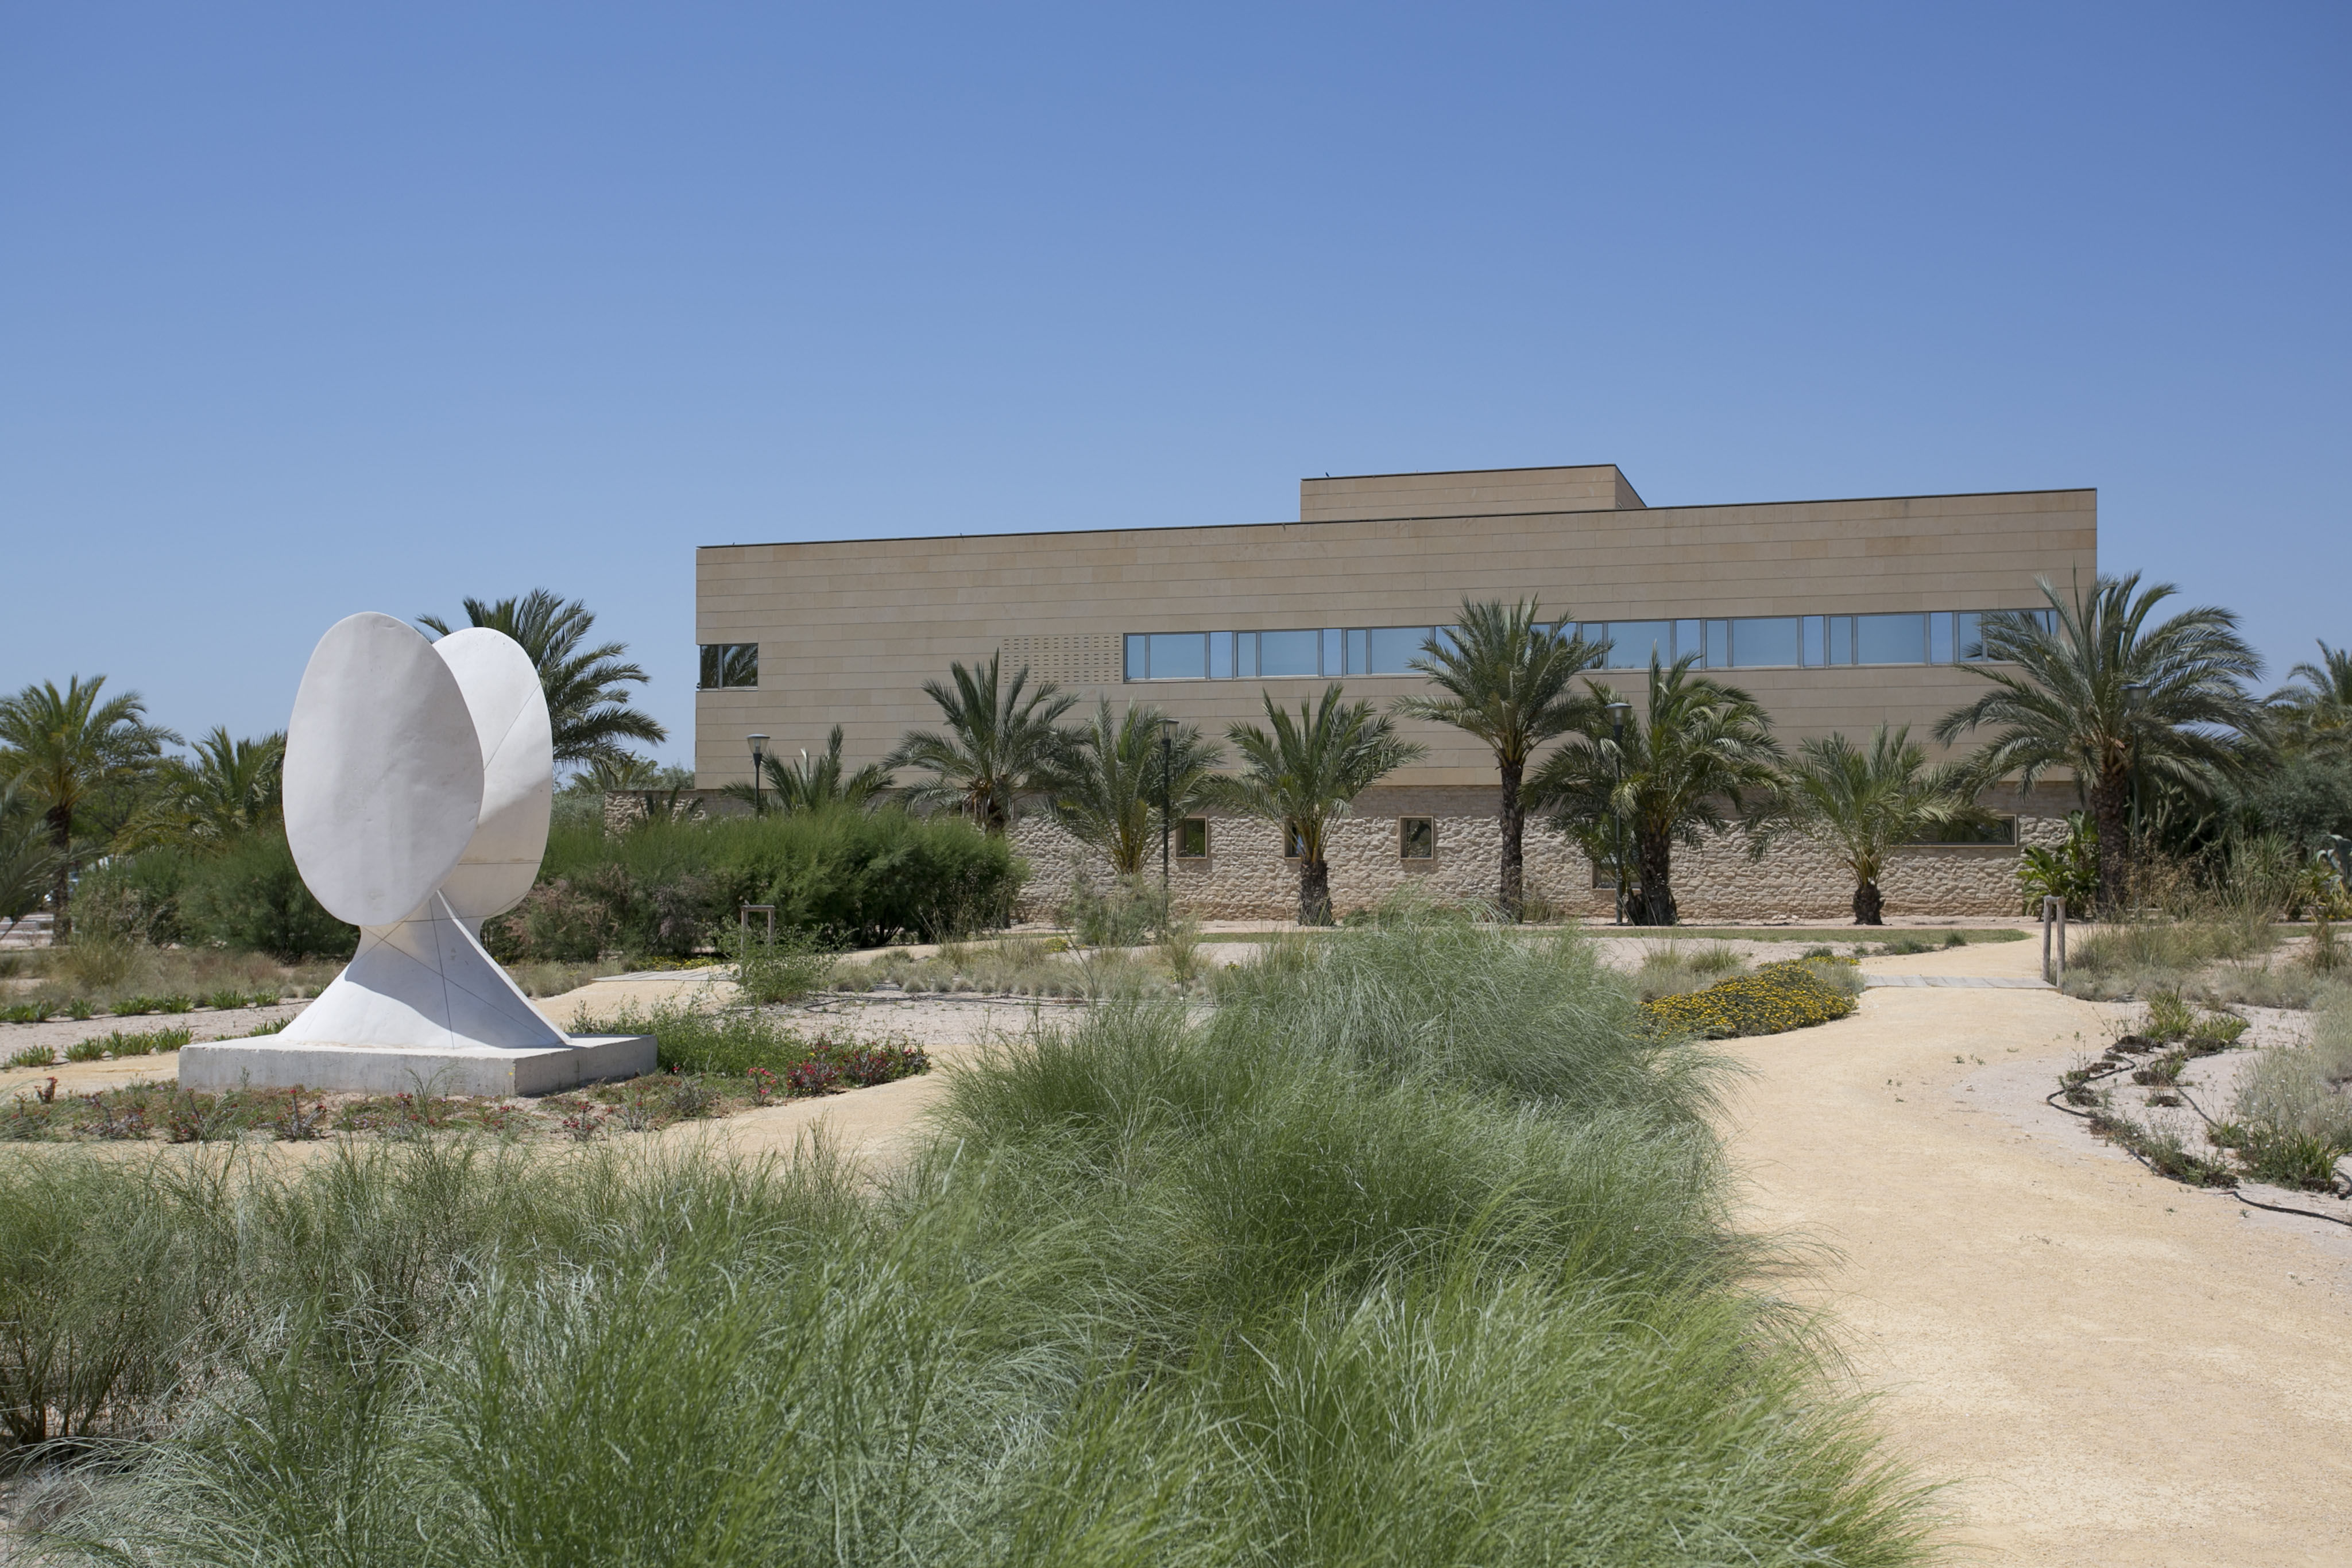 Campus-Elche-exteriores_K8B2404